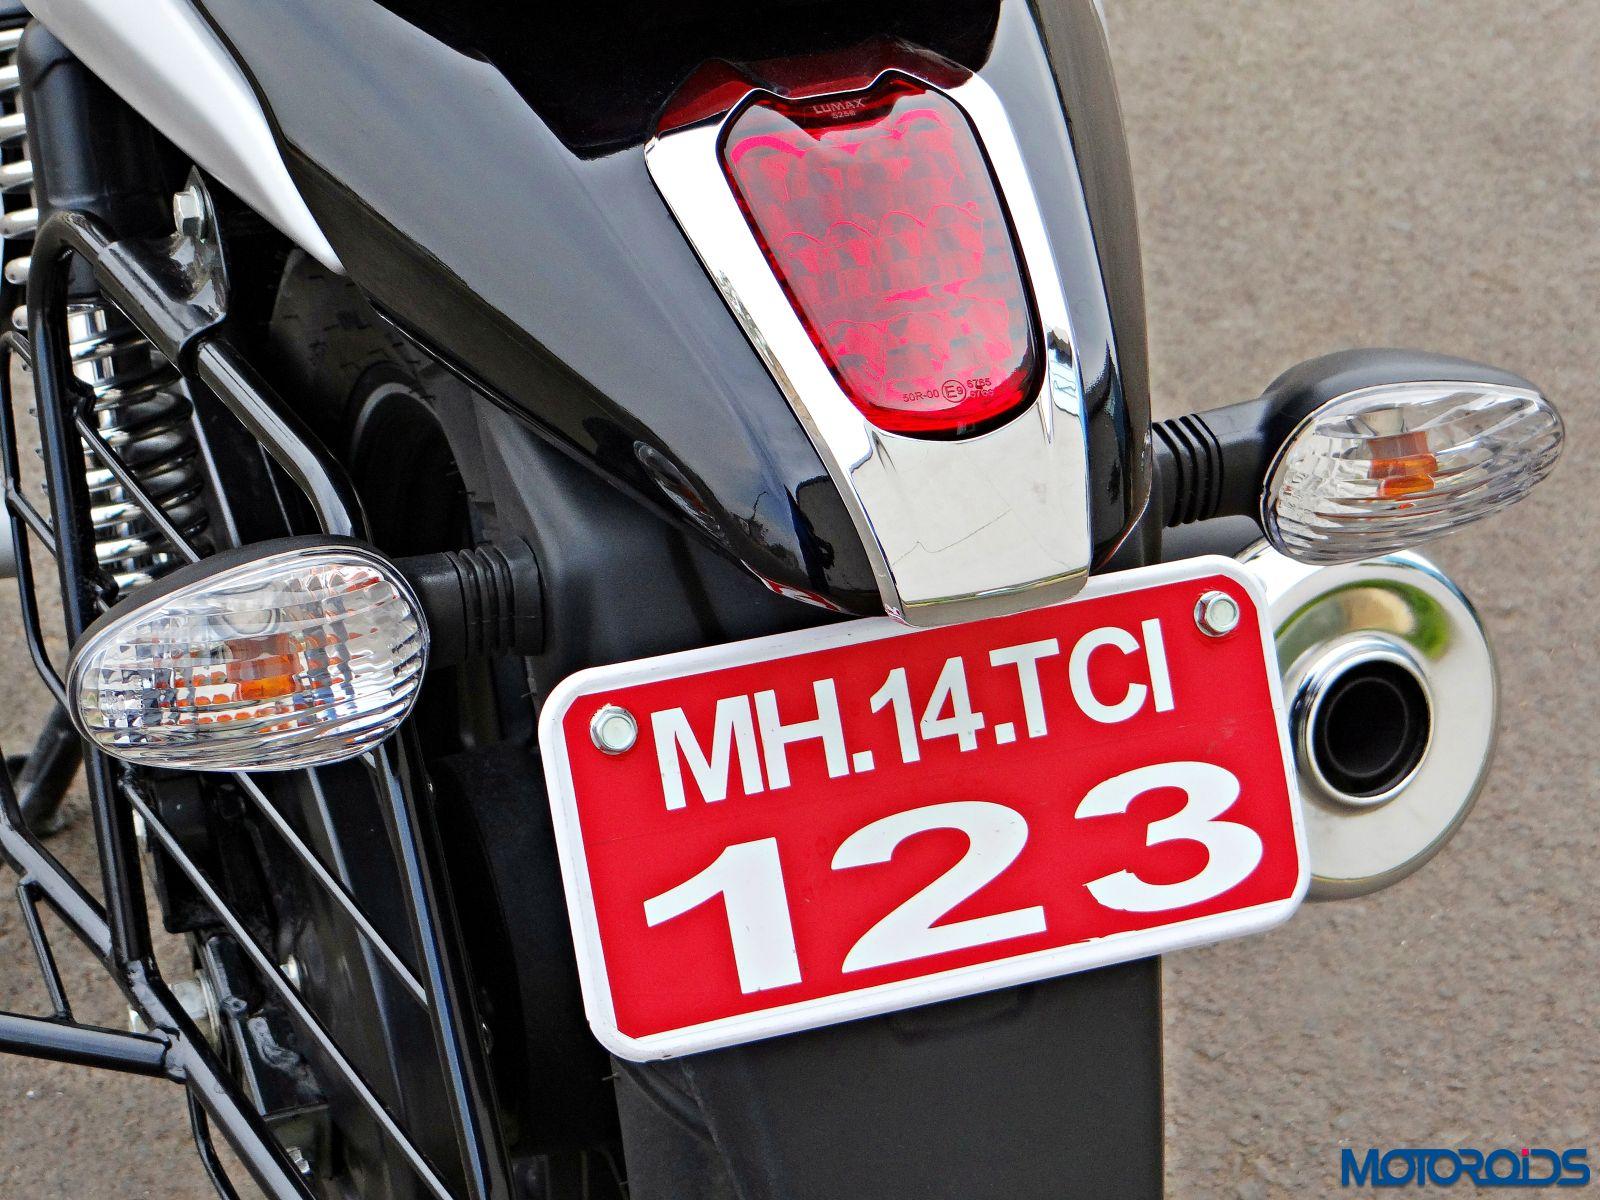 Bajaj V15 - Review - Details - Tail Light (1)